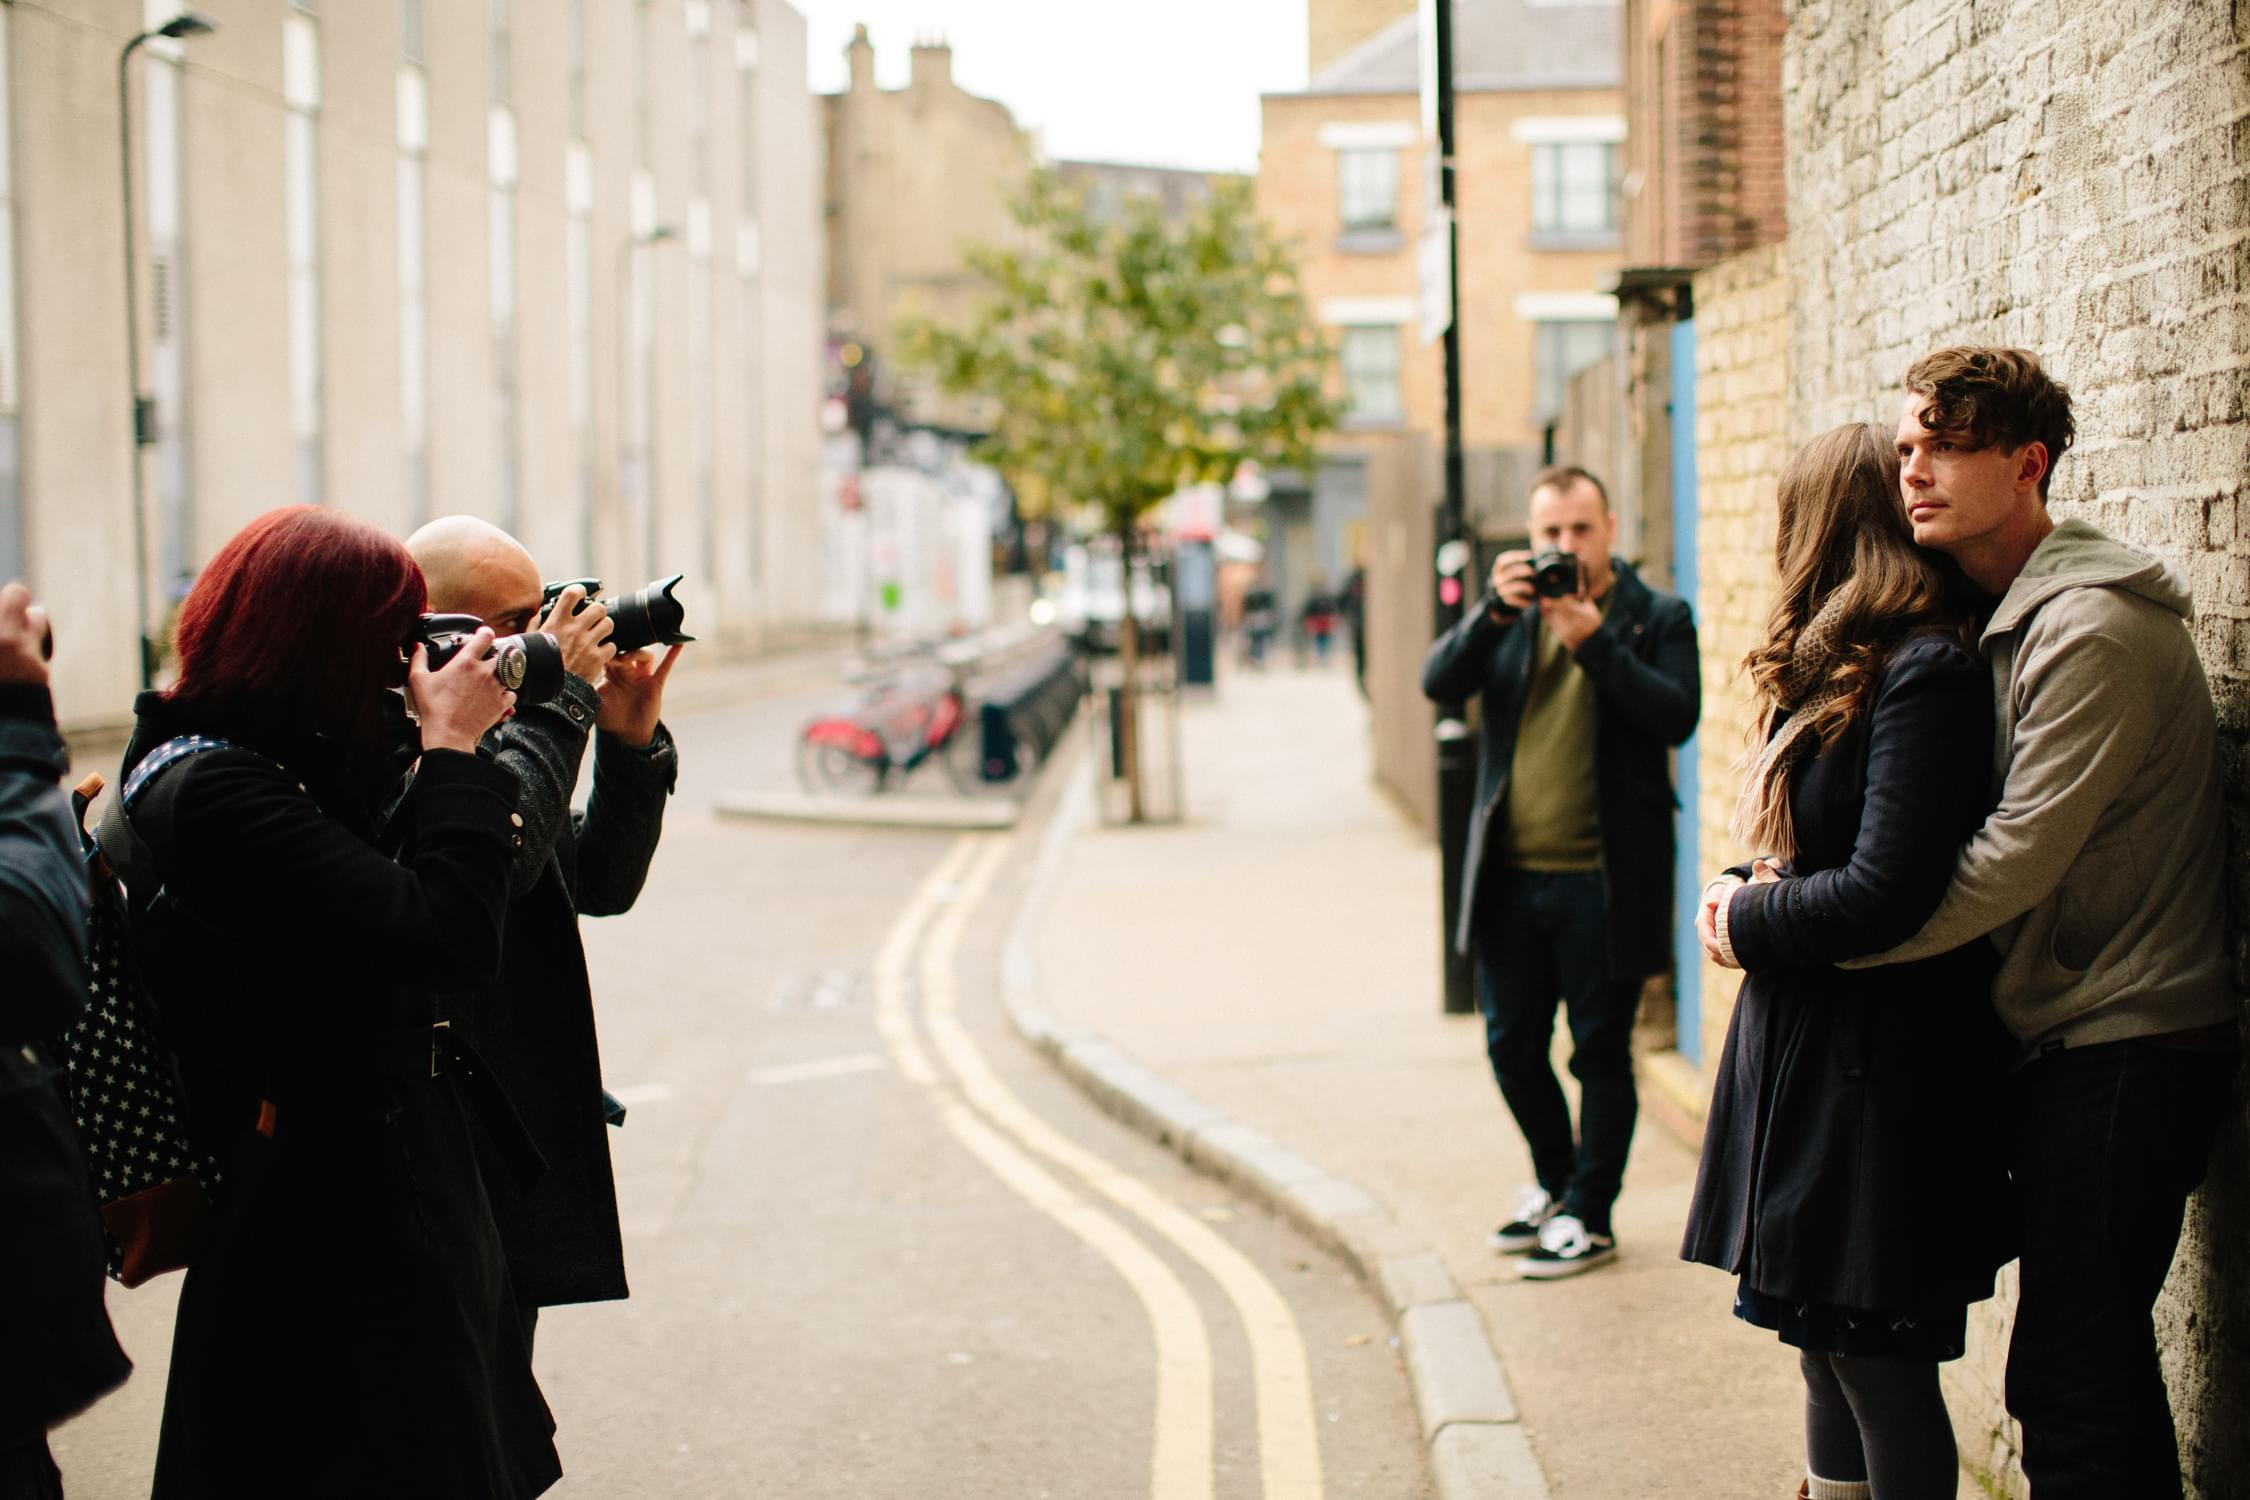 share-the-journey-london-wedding-photography-workshop-19